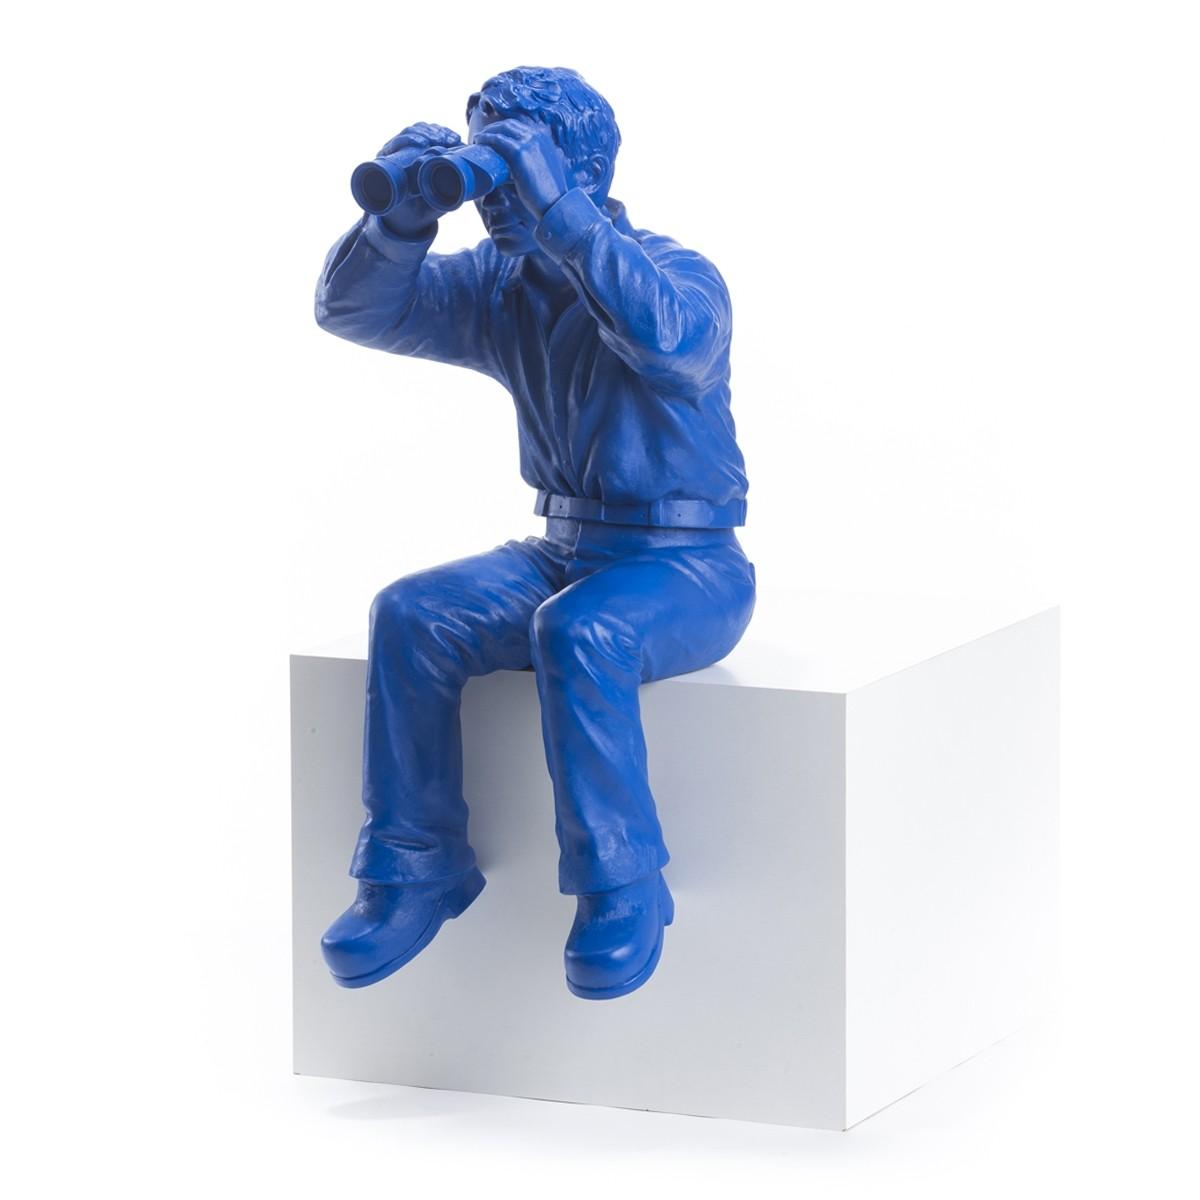 Weltanschauungsmodell I B blau - Hörl, Ottmar - k-20HWIB.bla